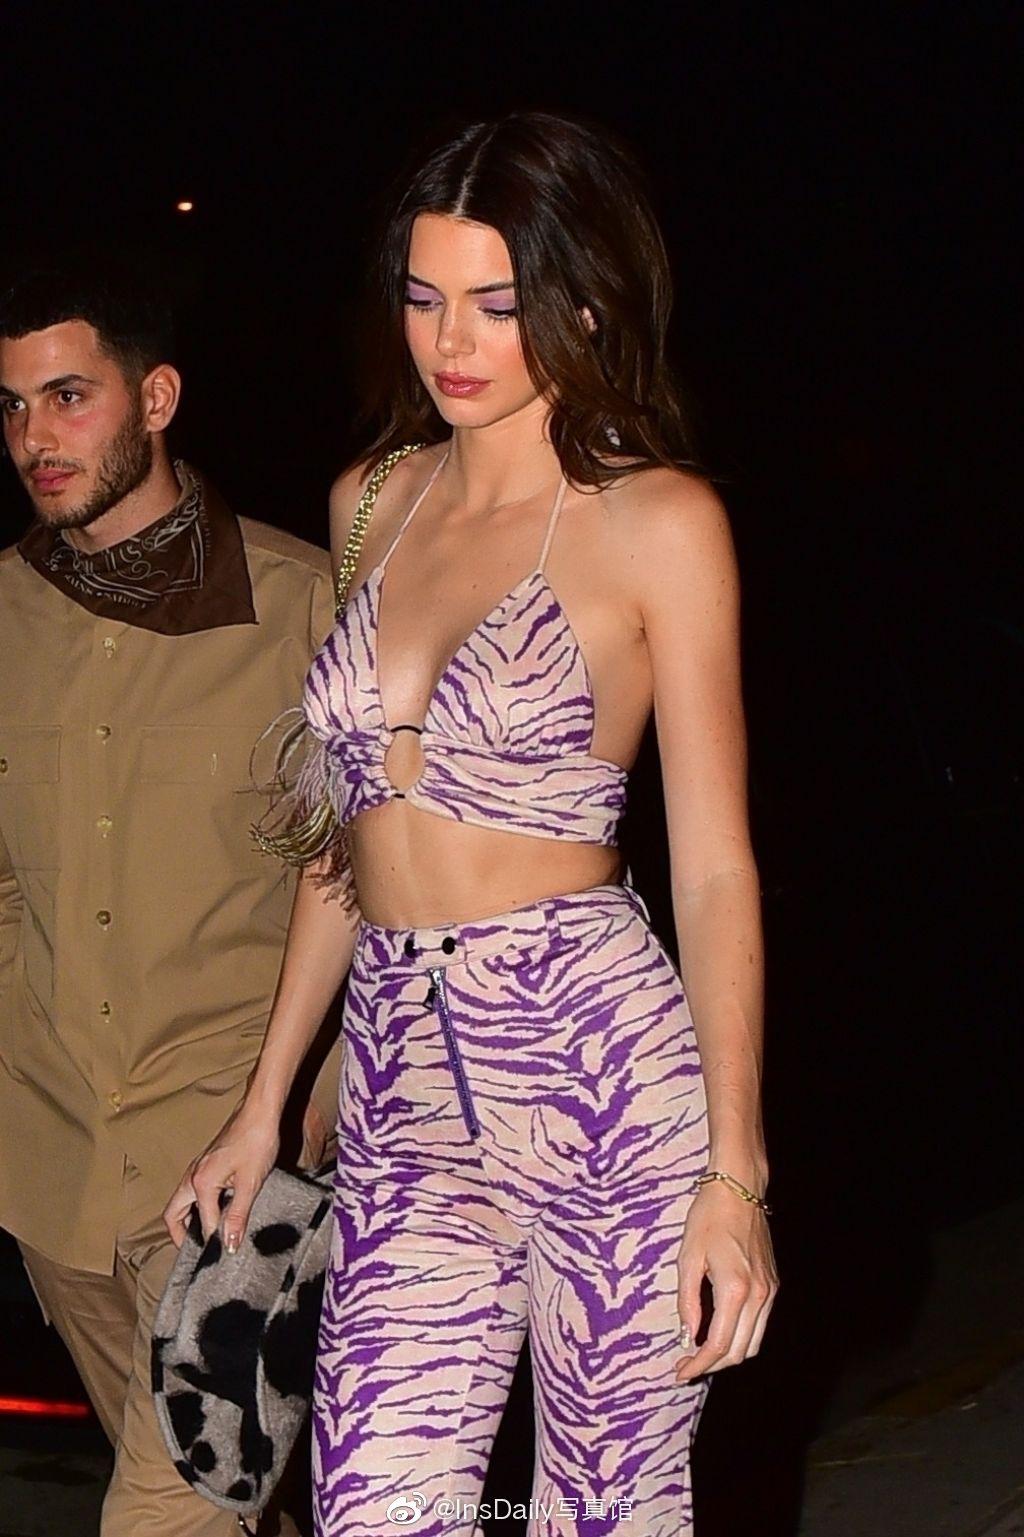 Kendall Jenner身着I.AM.Gia的紫色斑马纹套装❤肯豆真的好绝一女的